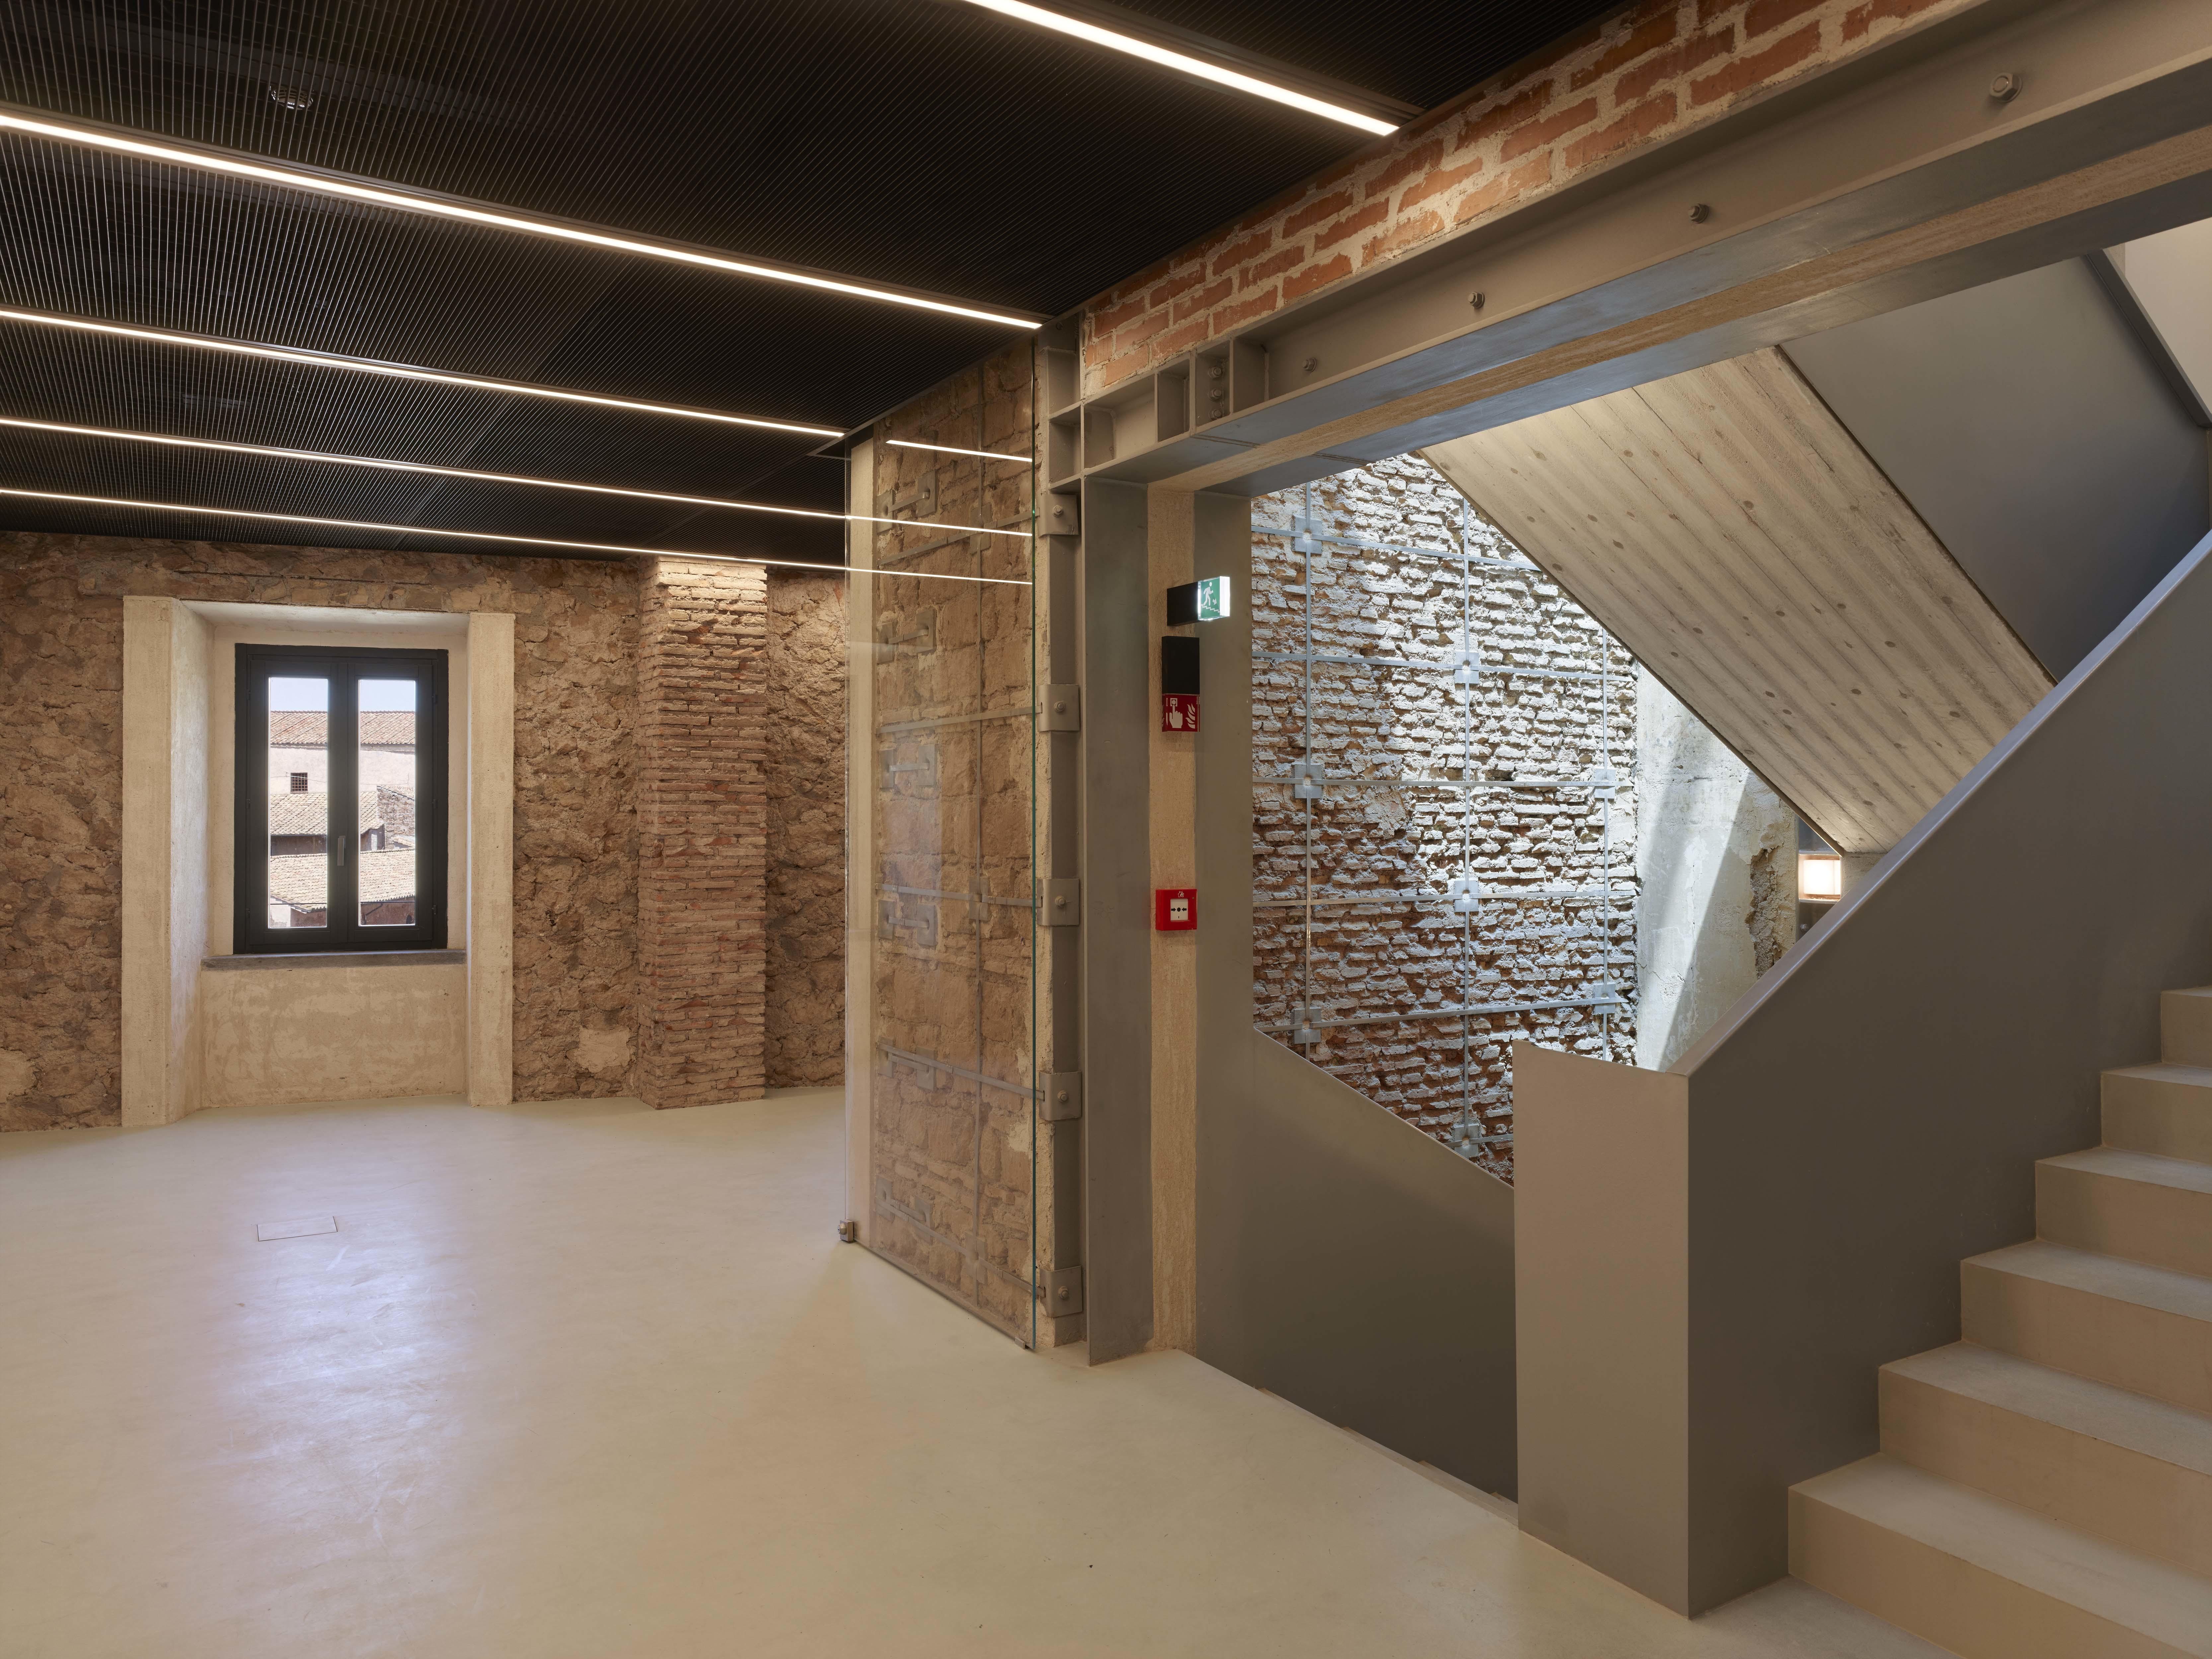 die fondazione alta fendi in rom von ateliers jean nouvel. Black Bedroom Furniture Sets. Home Design Ideas